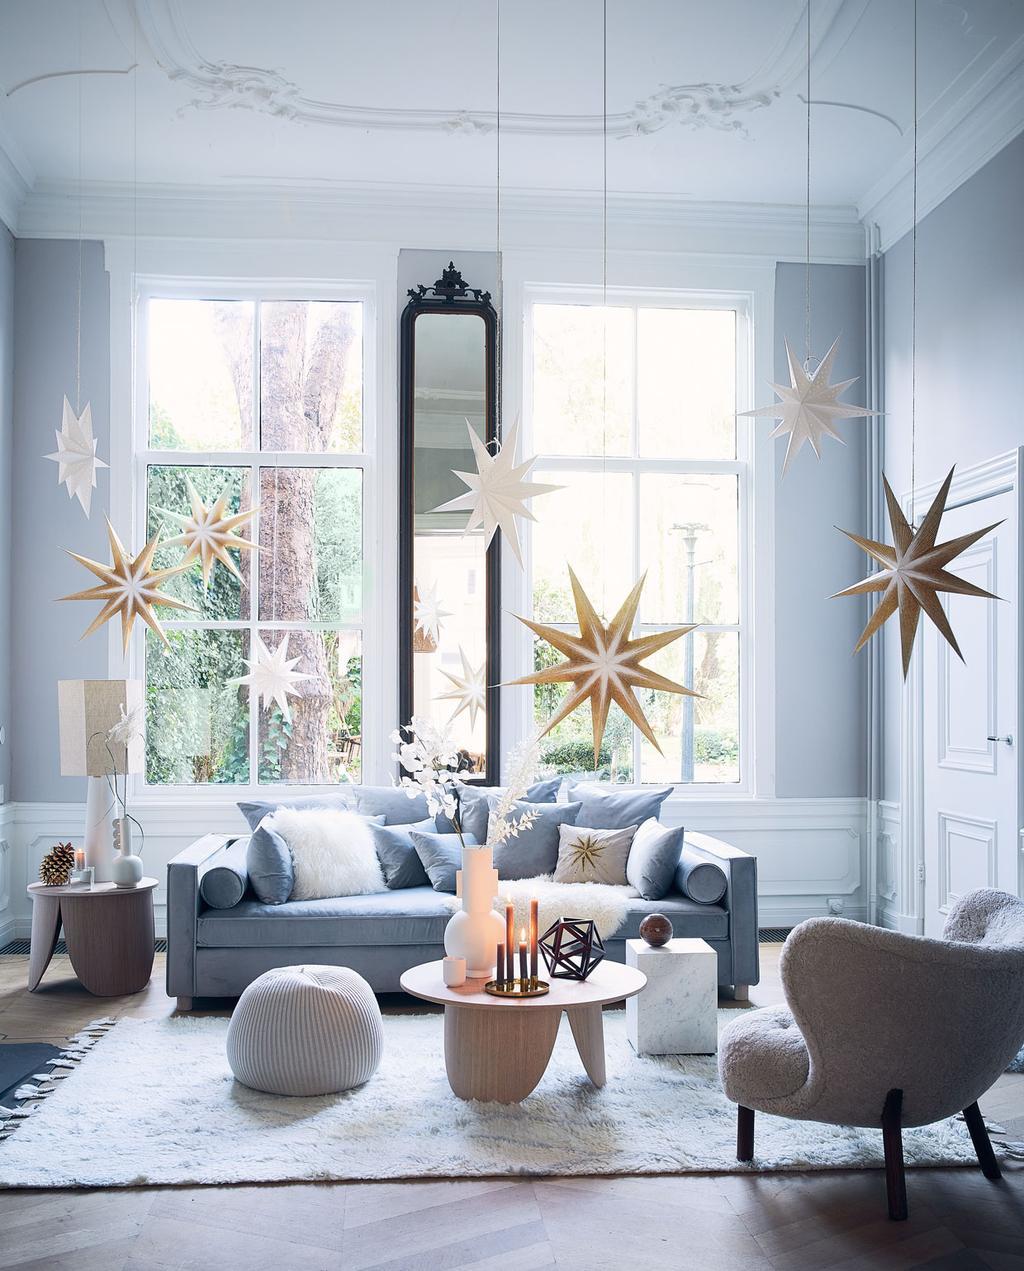 vtwonen 12-2019 | kerst woonkamer sterren